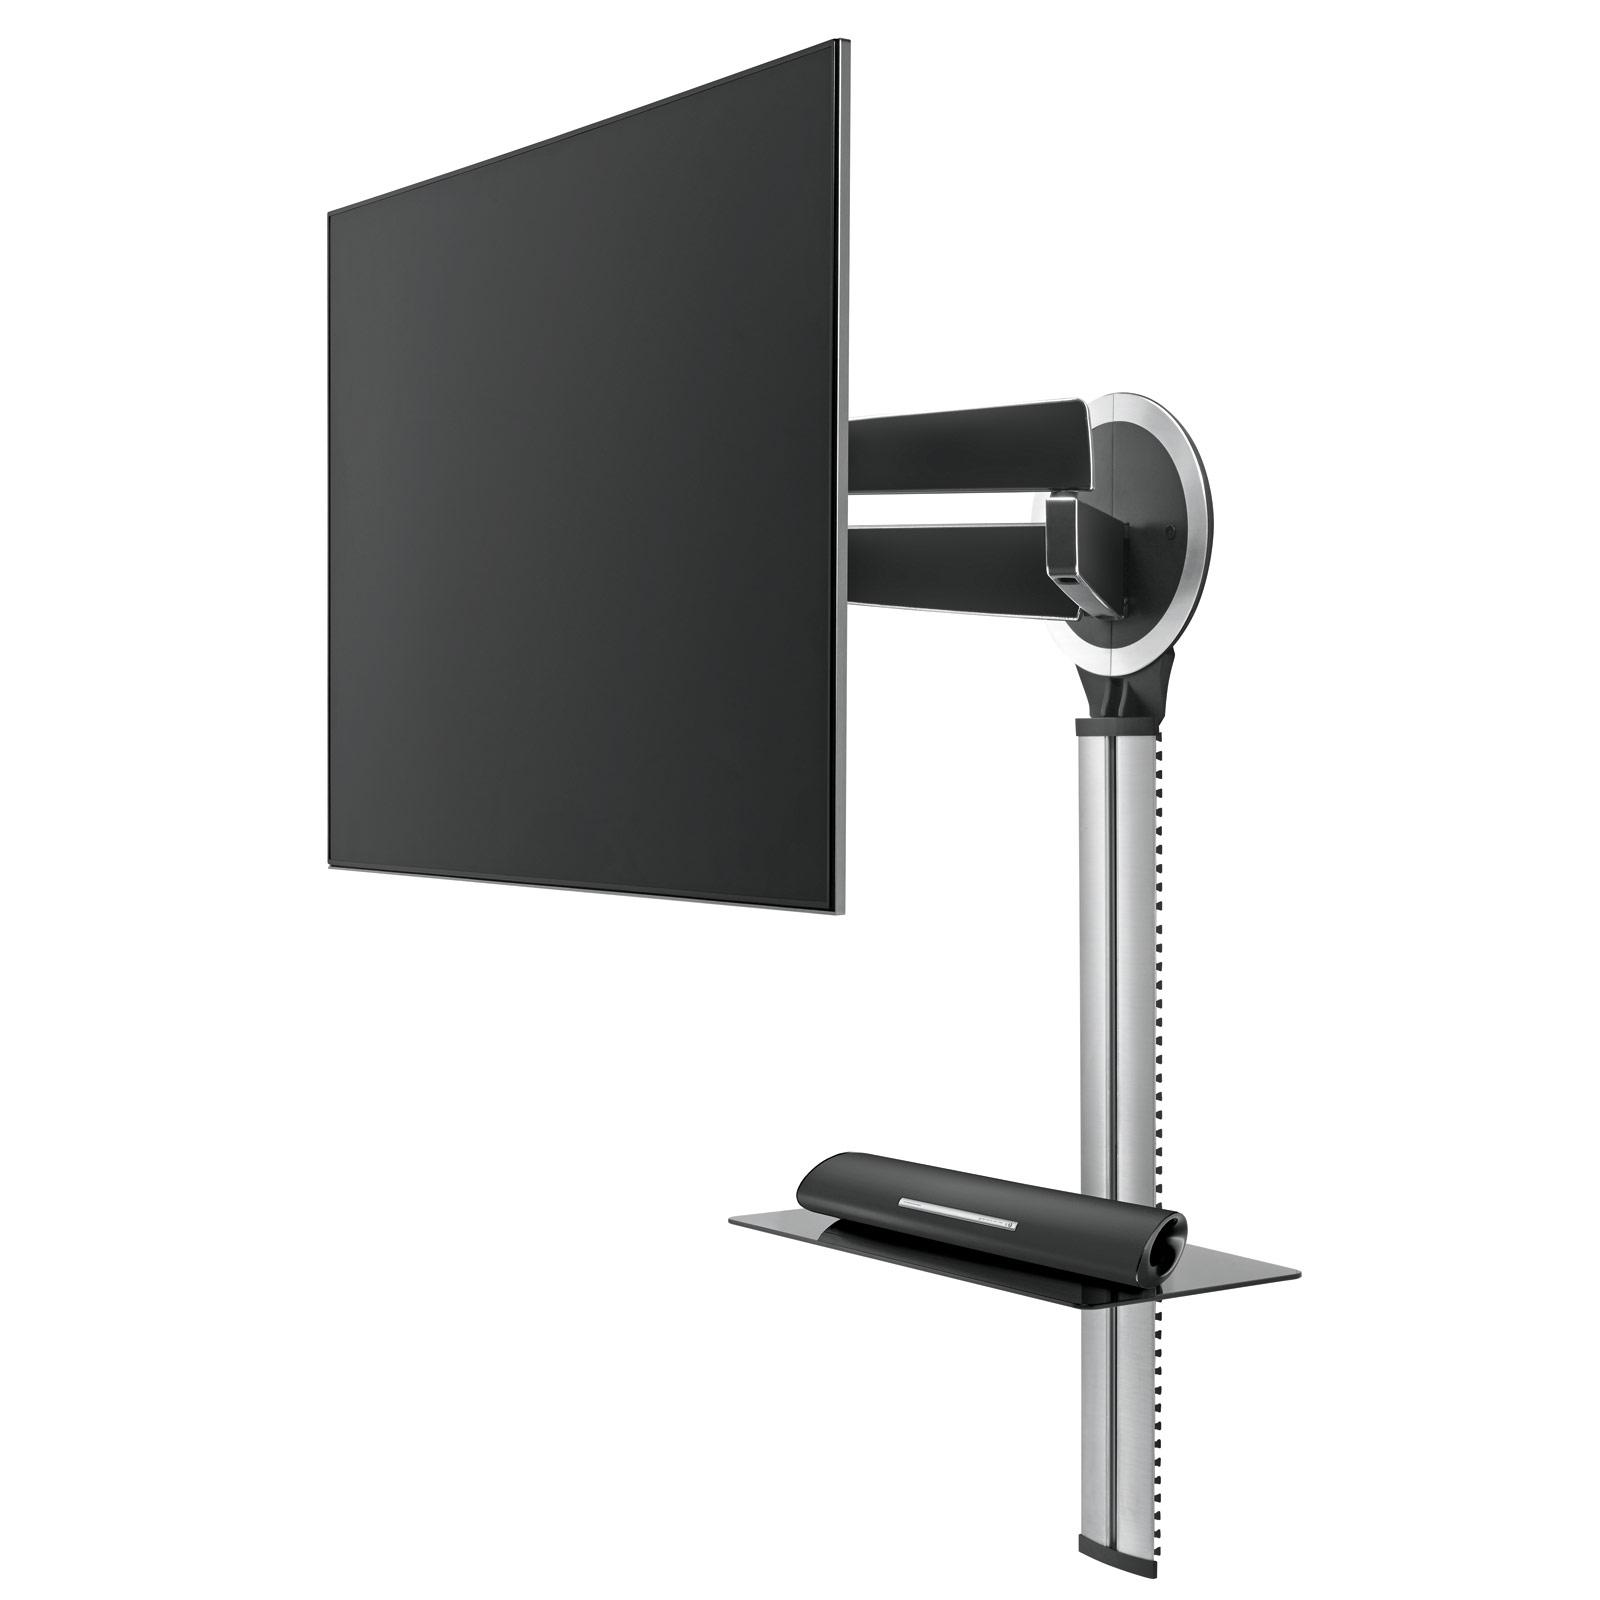 vogels 7345 support mural tv next orientable pour cran plat comparer avec. Black Bedroom Furniture Sets. Home Design Ideas